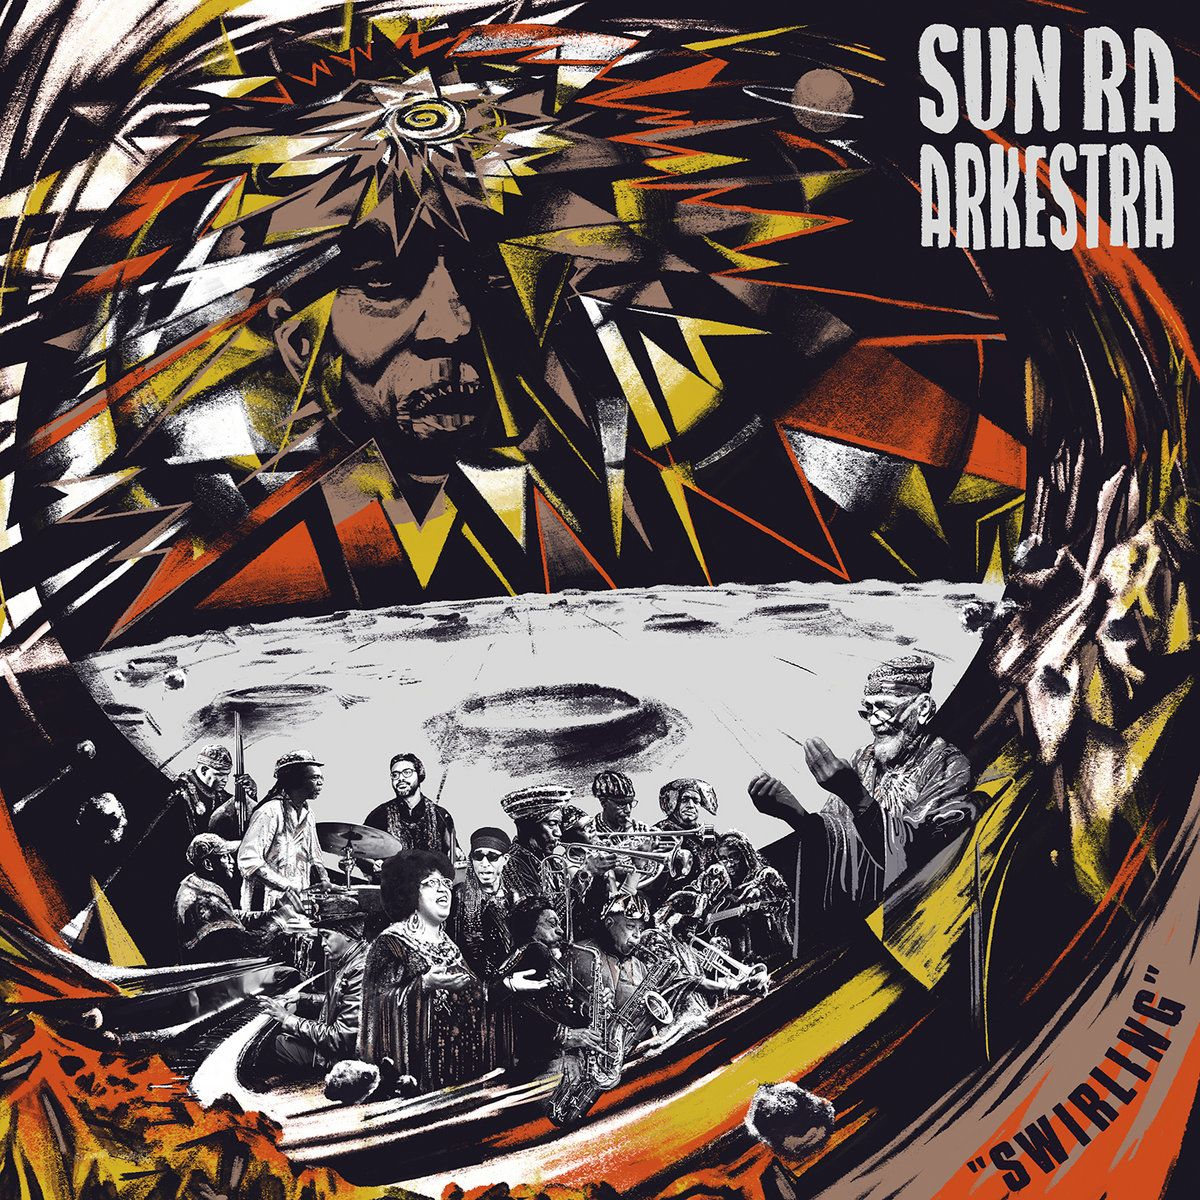 Sun Ra Arkestra - Swirling - 2LP